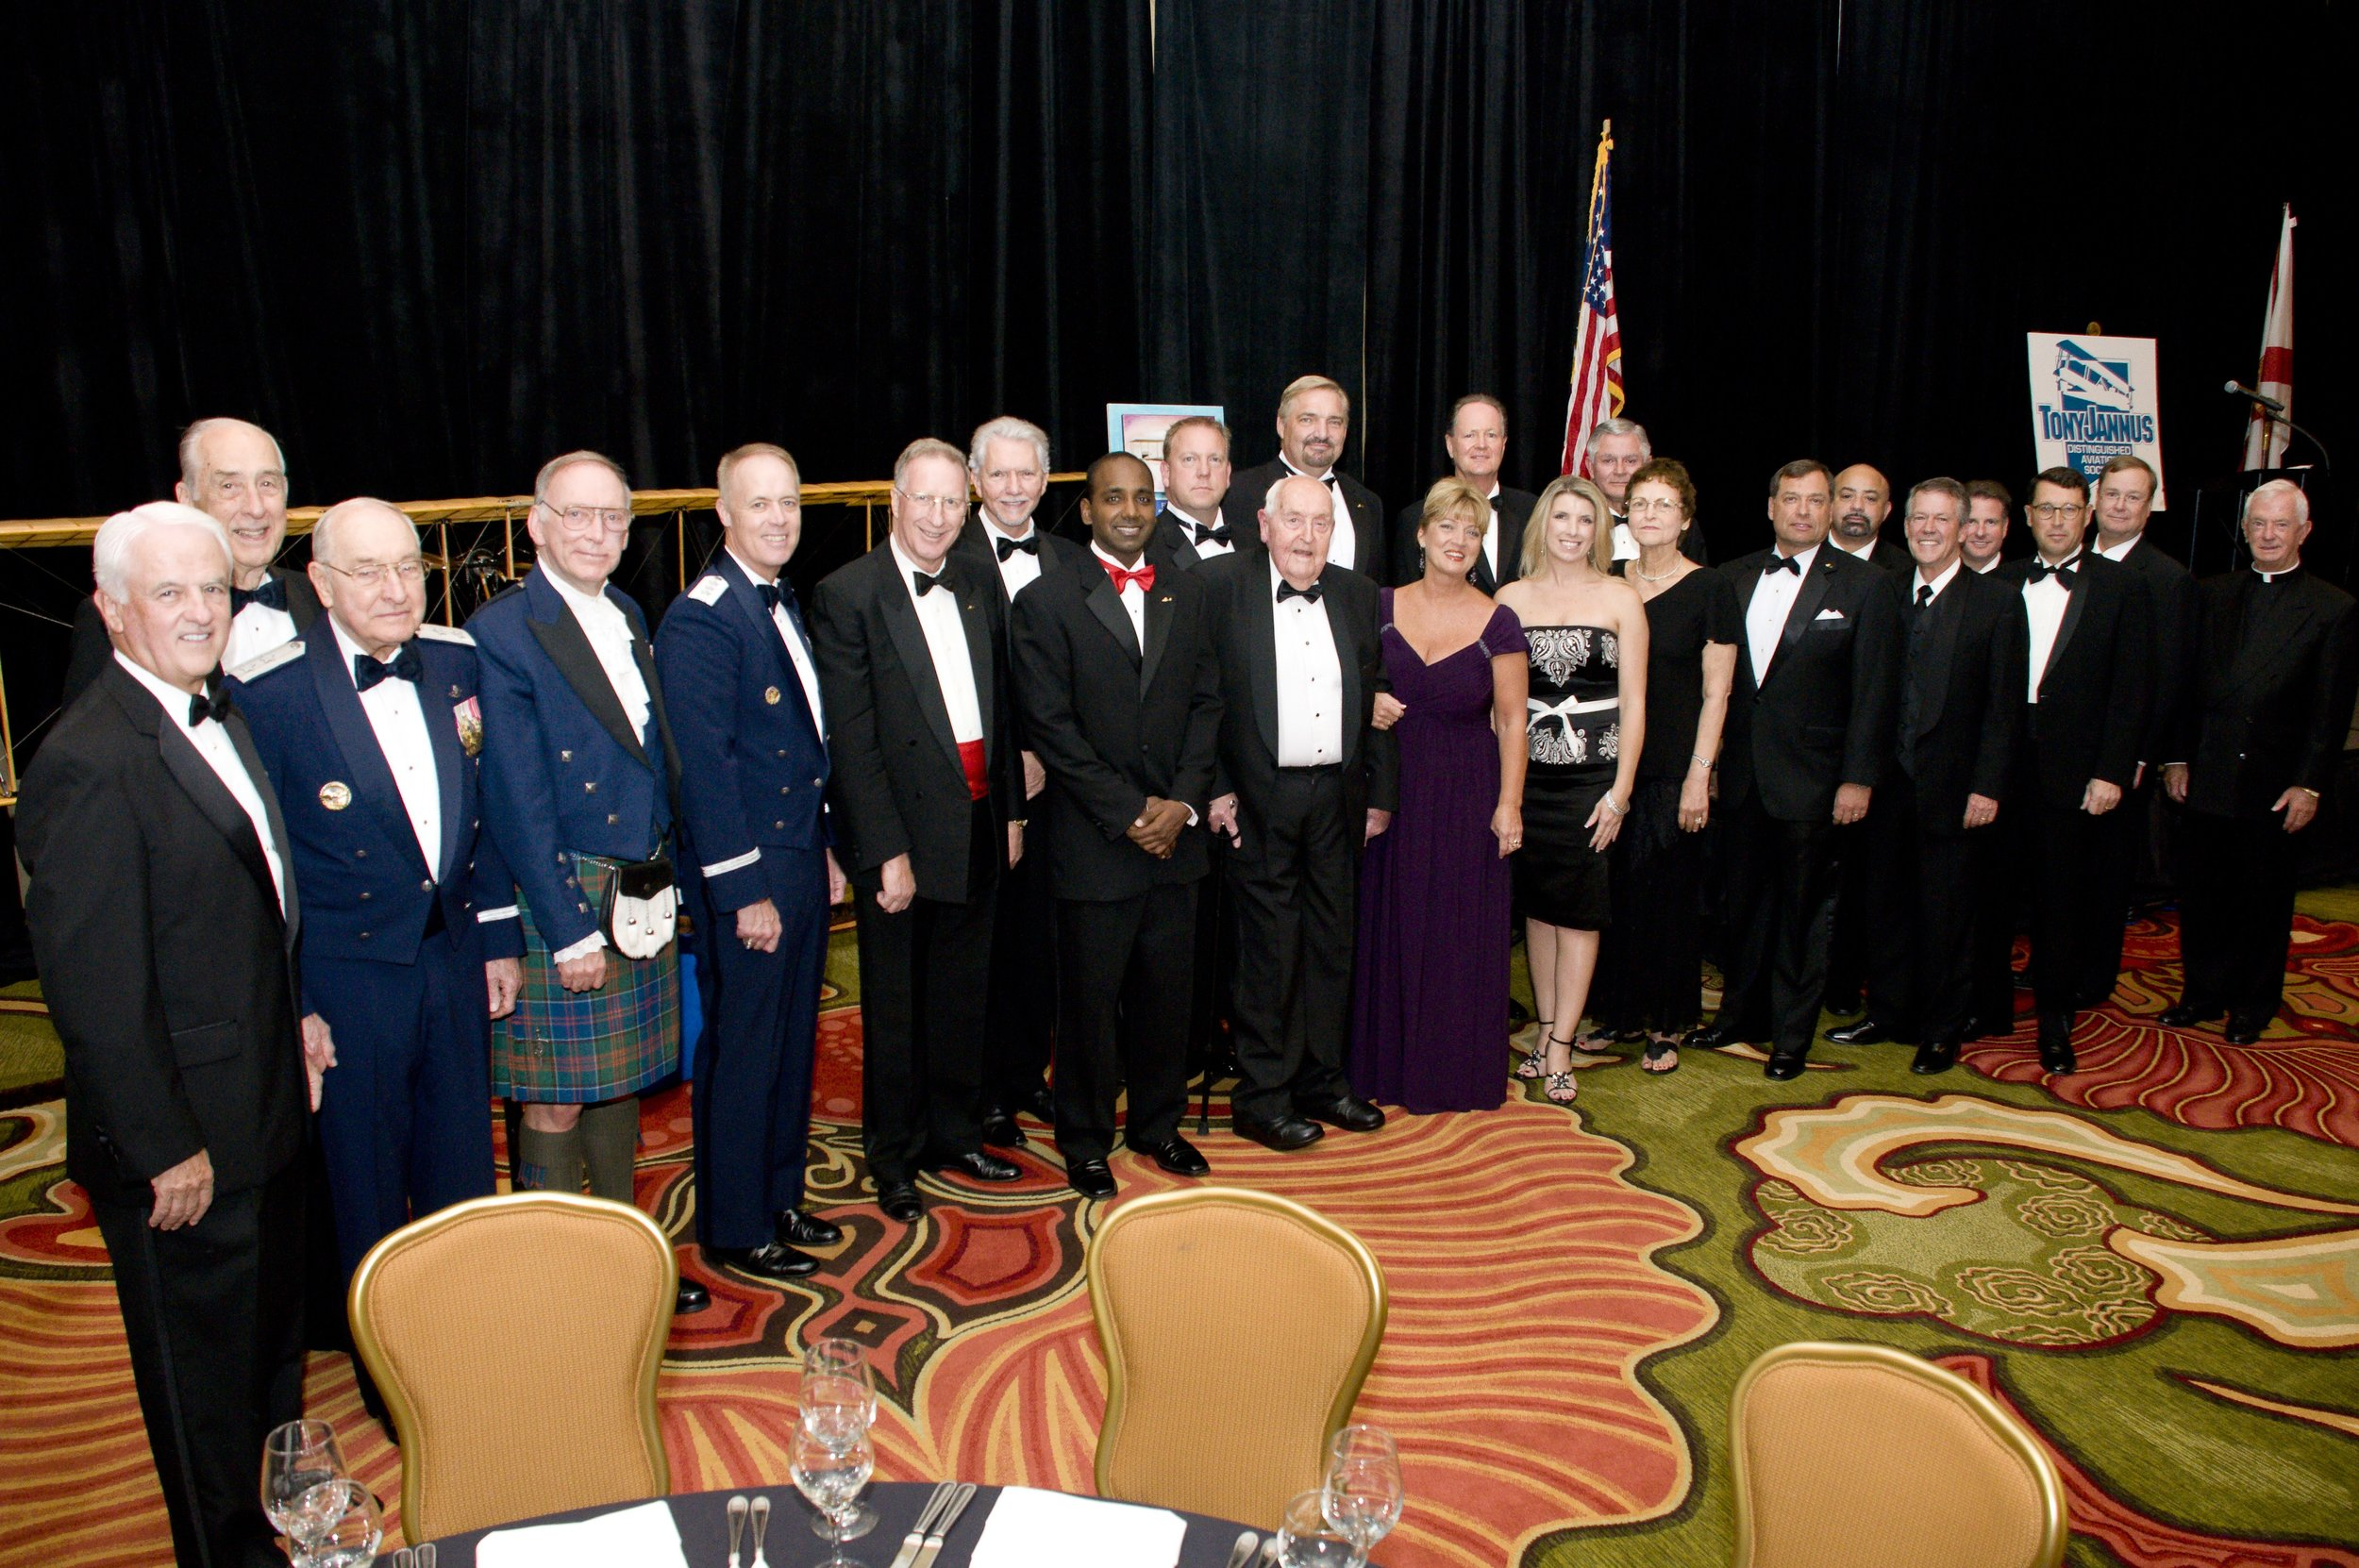 Board Members & Prior-Year Award Recipients - 1, 29 Oct '10.jpg